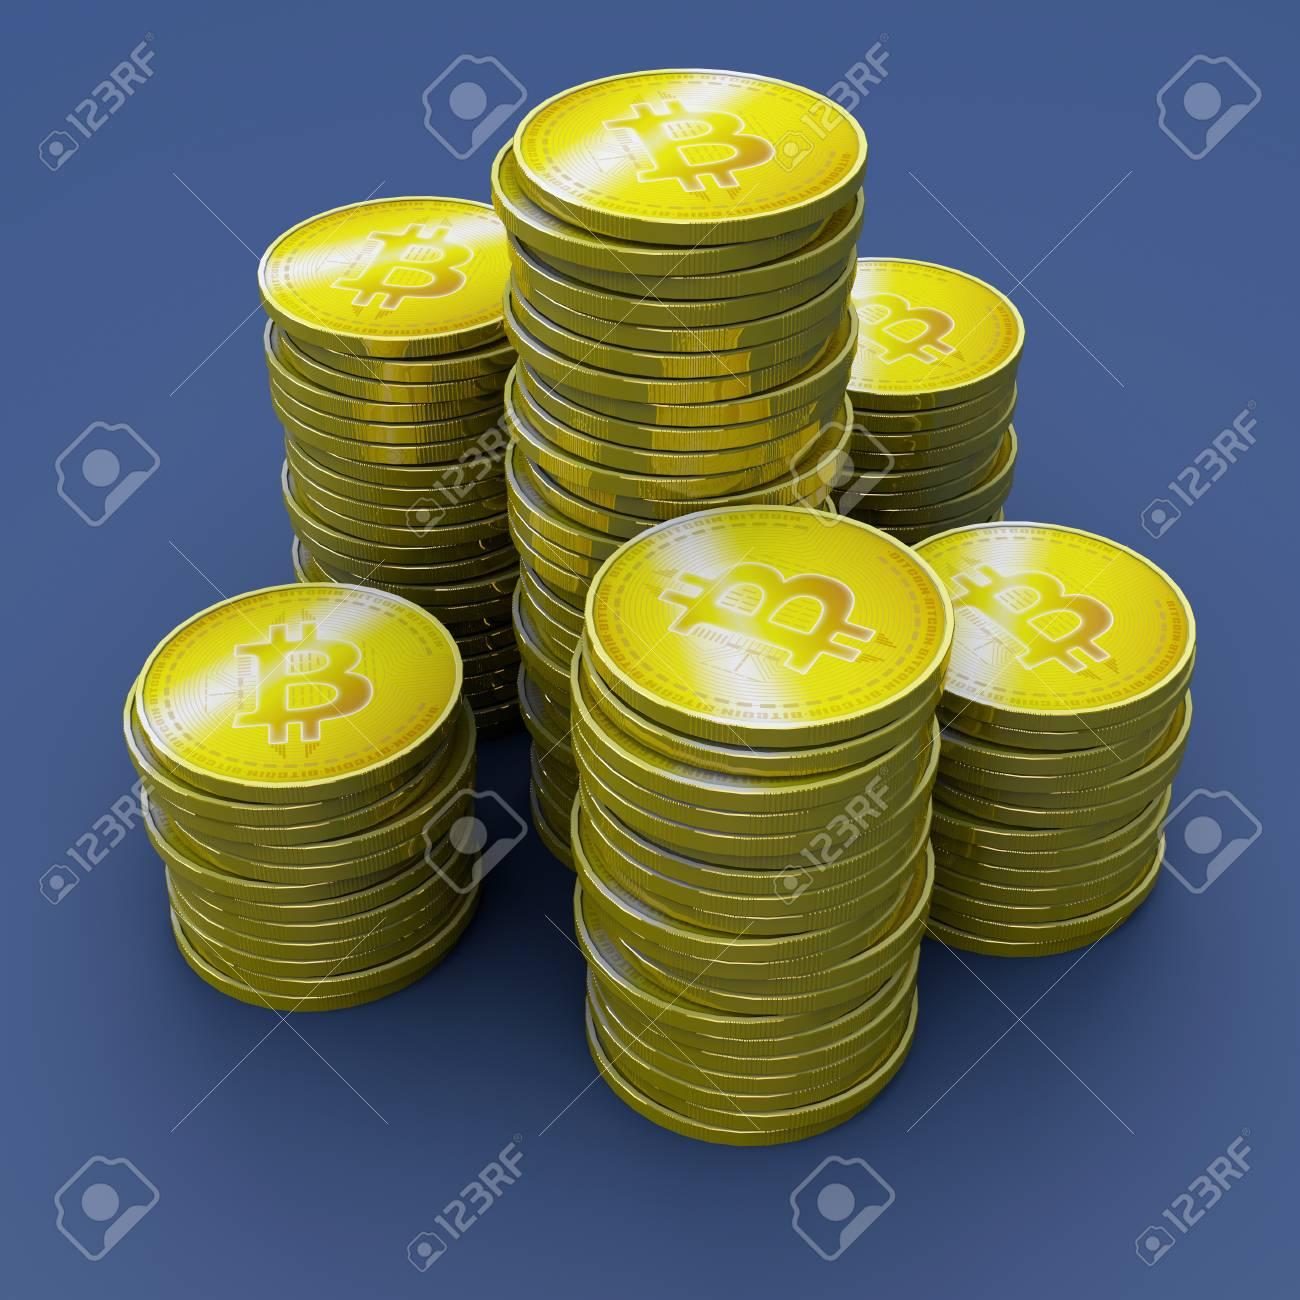 Elektronisches geld bitcoins nba online betting